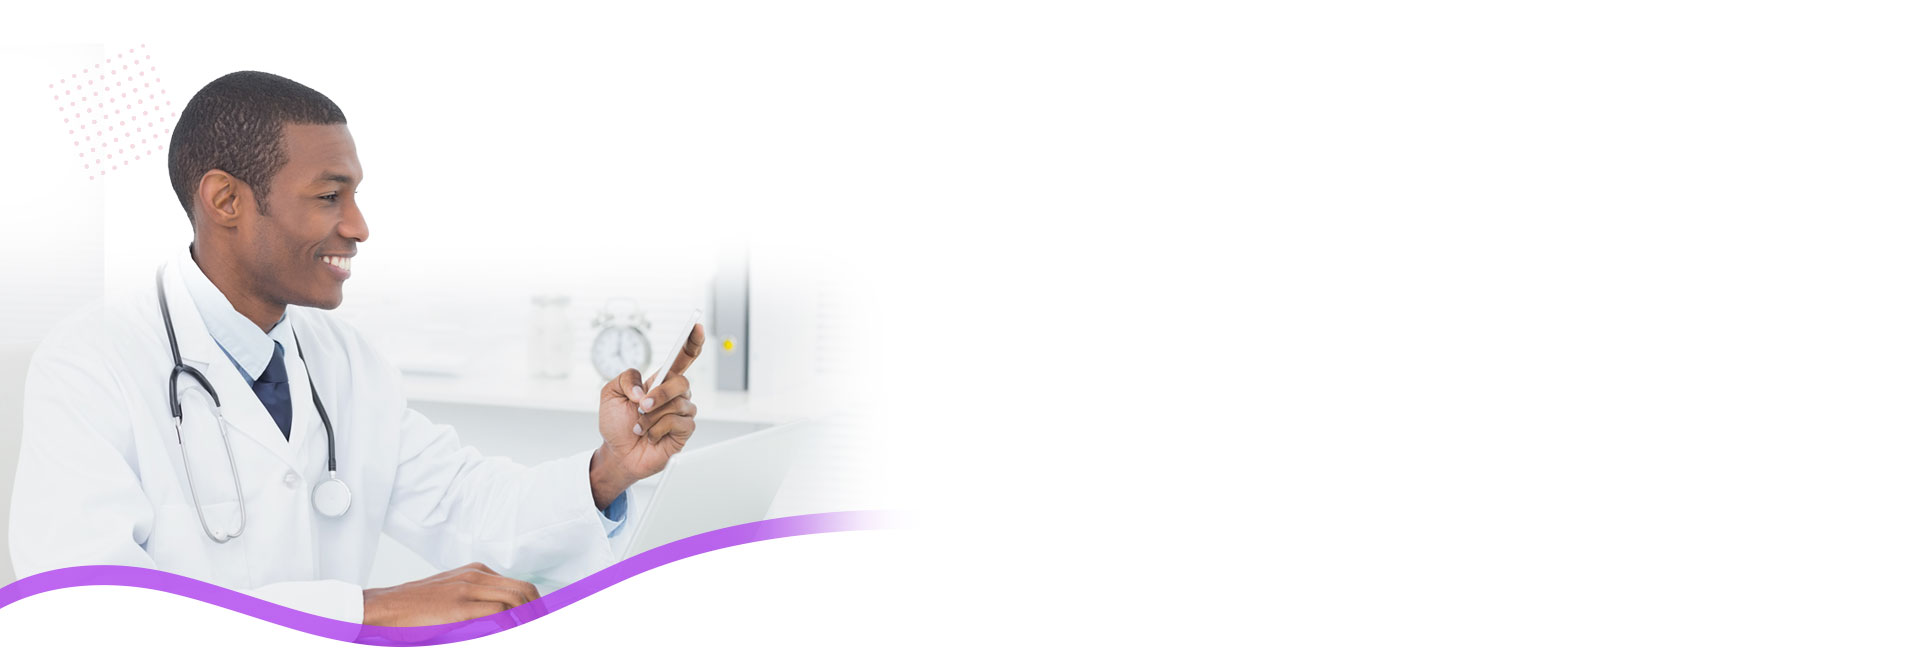 doctor-phone-large-desktop-2